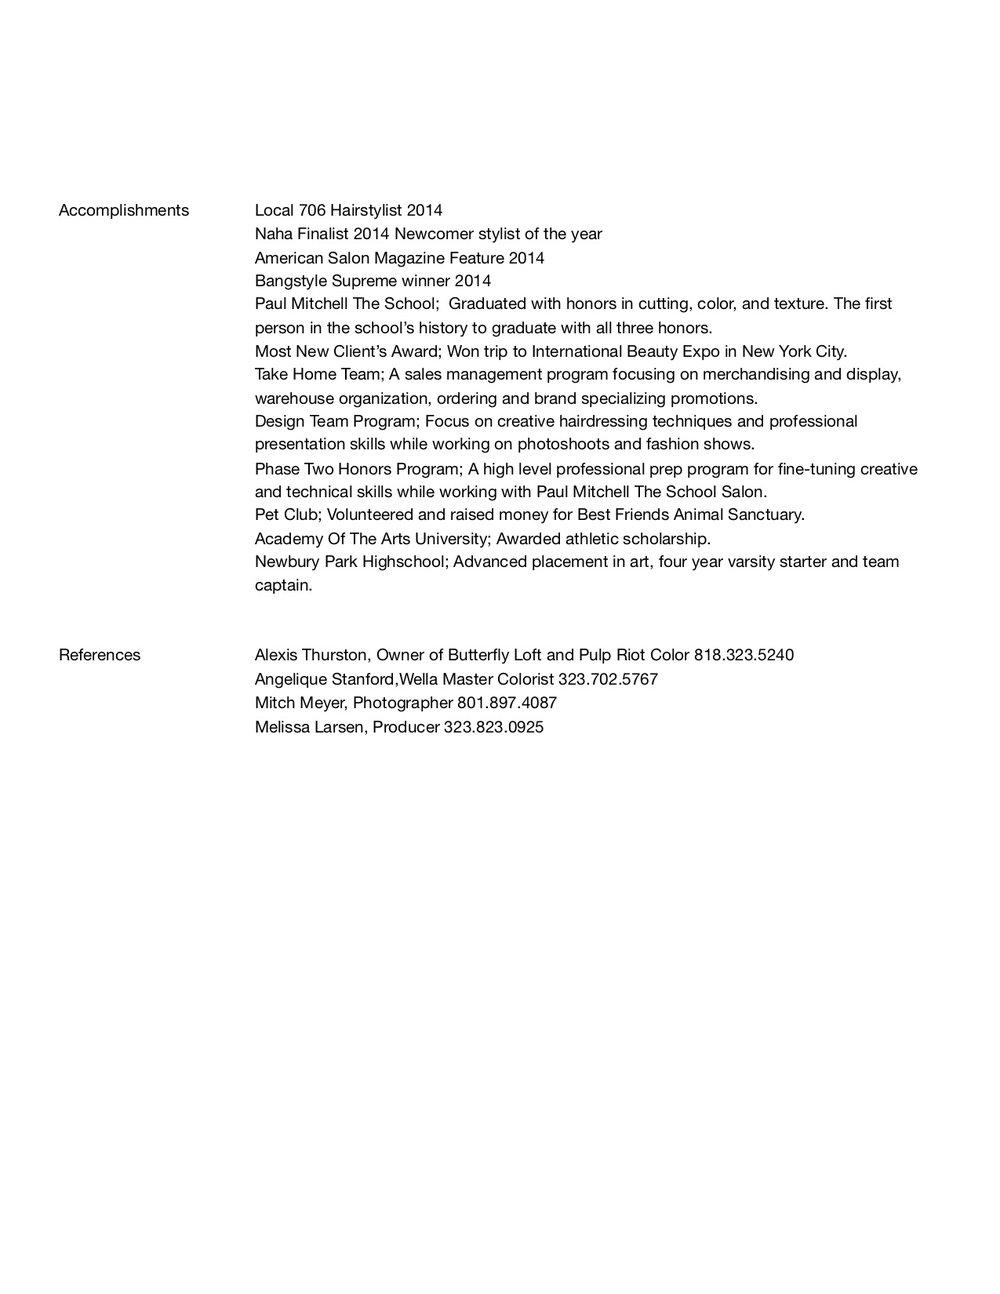 Bailey Bute Resume 2018 part 2 .jpg